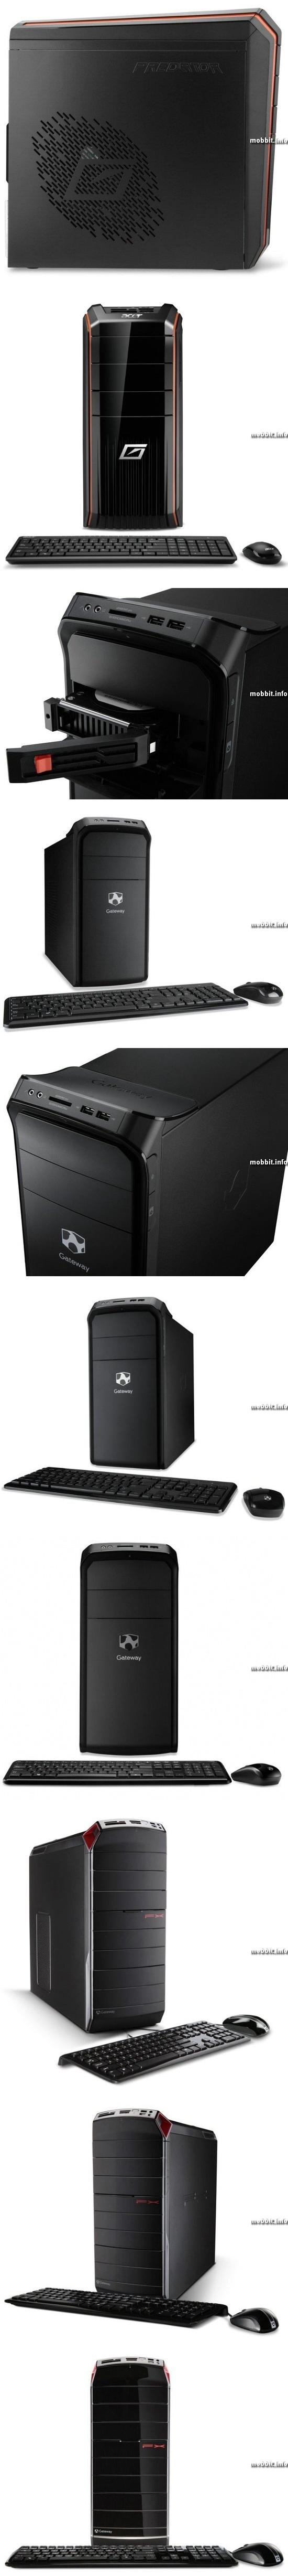 Predator AG3620 и Gateway DX4870 / FX6860